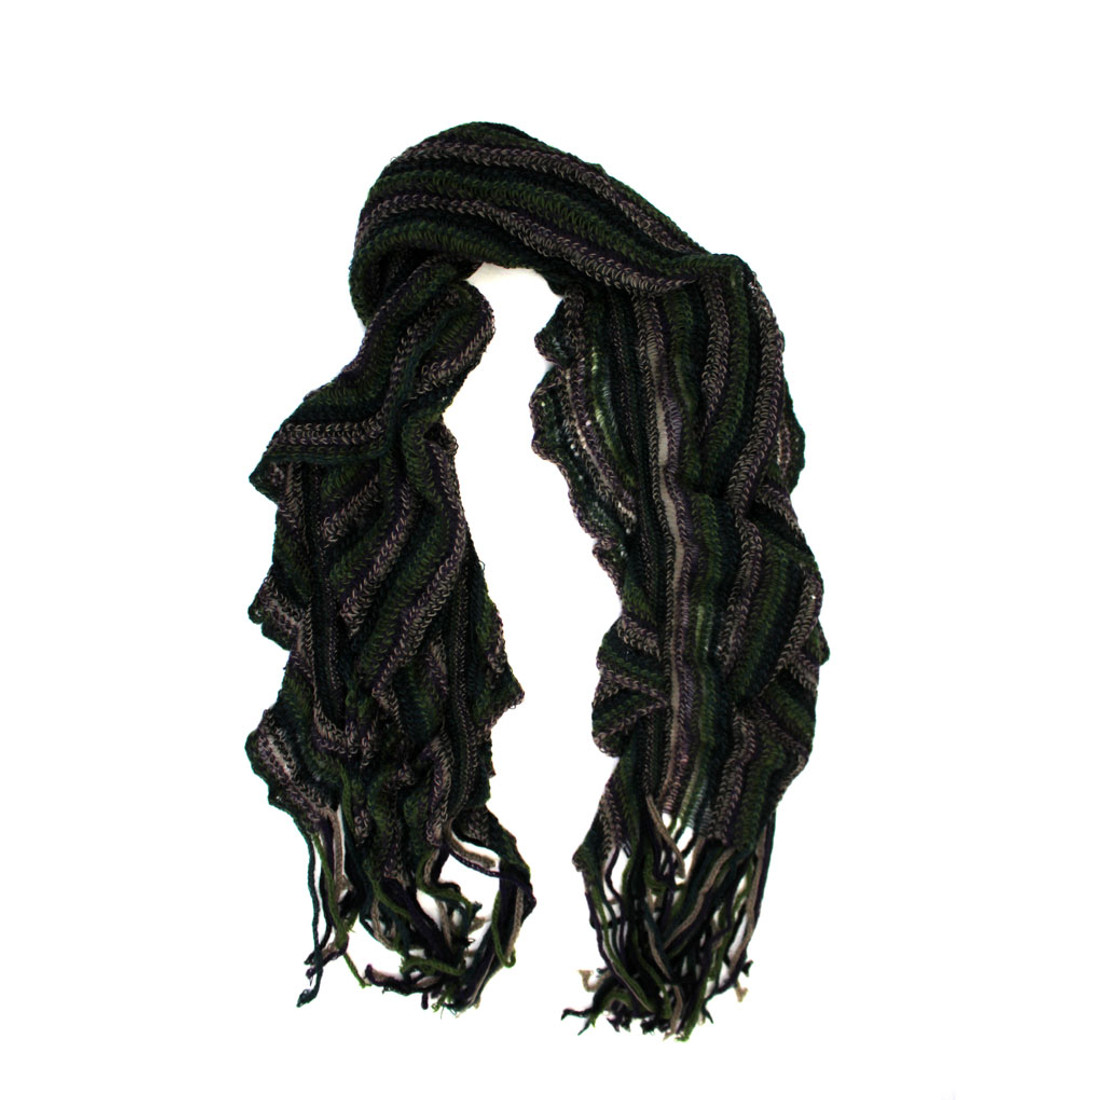 Olive striped scarf.